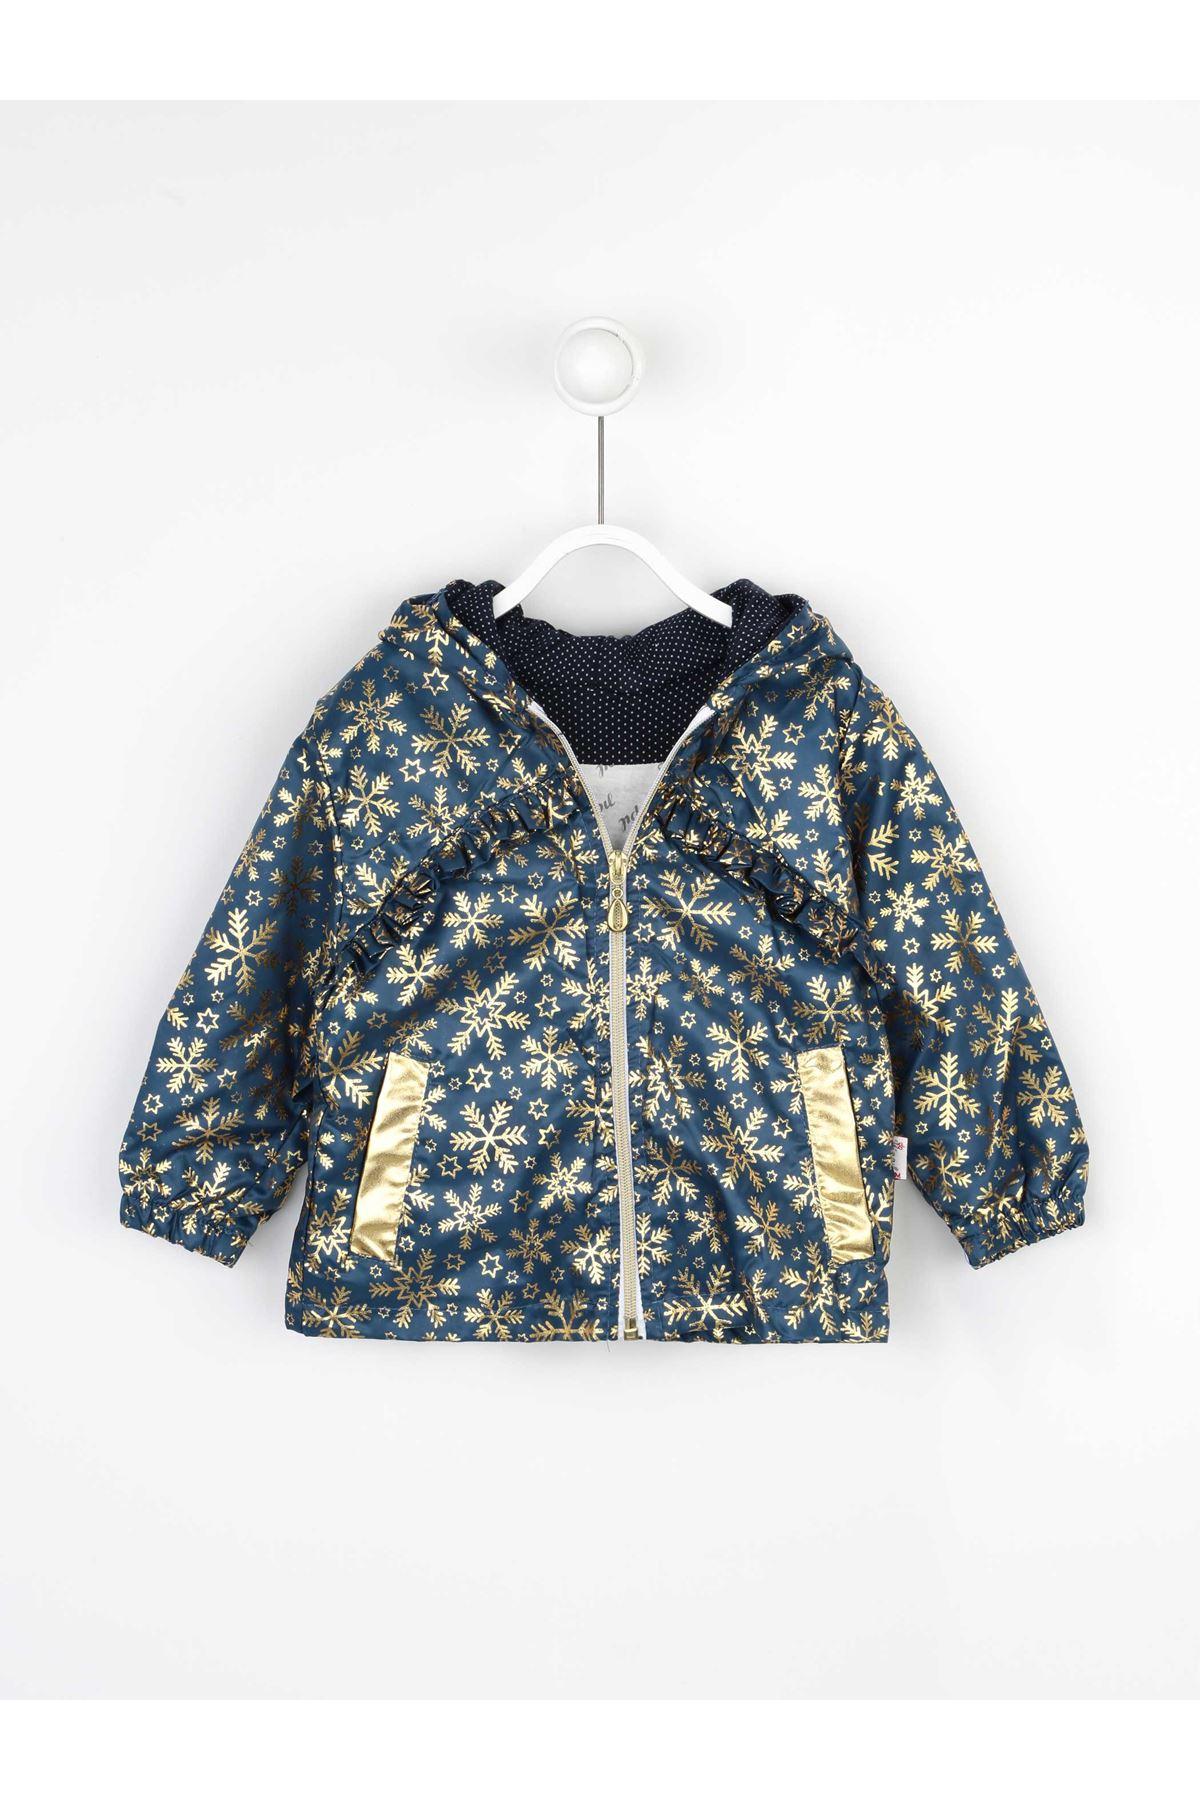 Navy Blue Girl child Hooded Raincoat Coats Seasonal Thin Waterproof girls Jacket Winter Rain Style Cute Kids coats Models